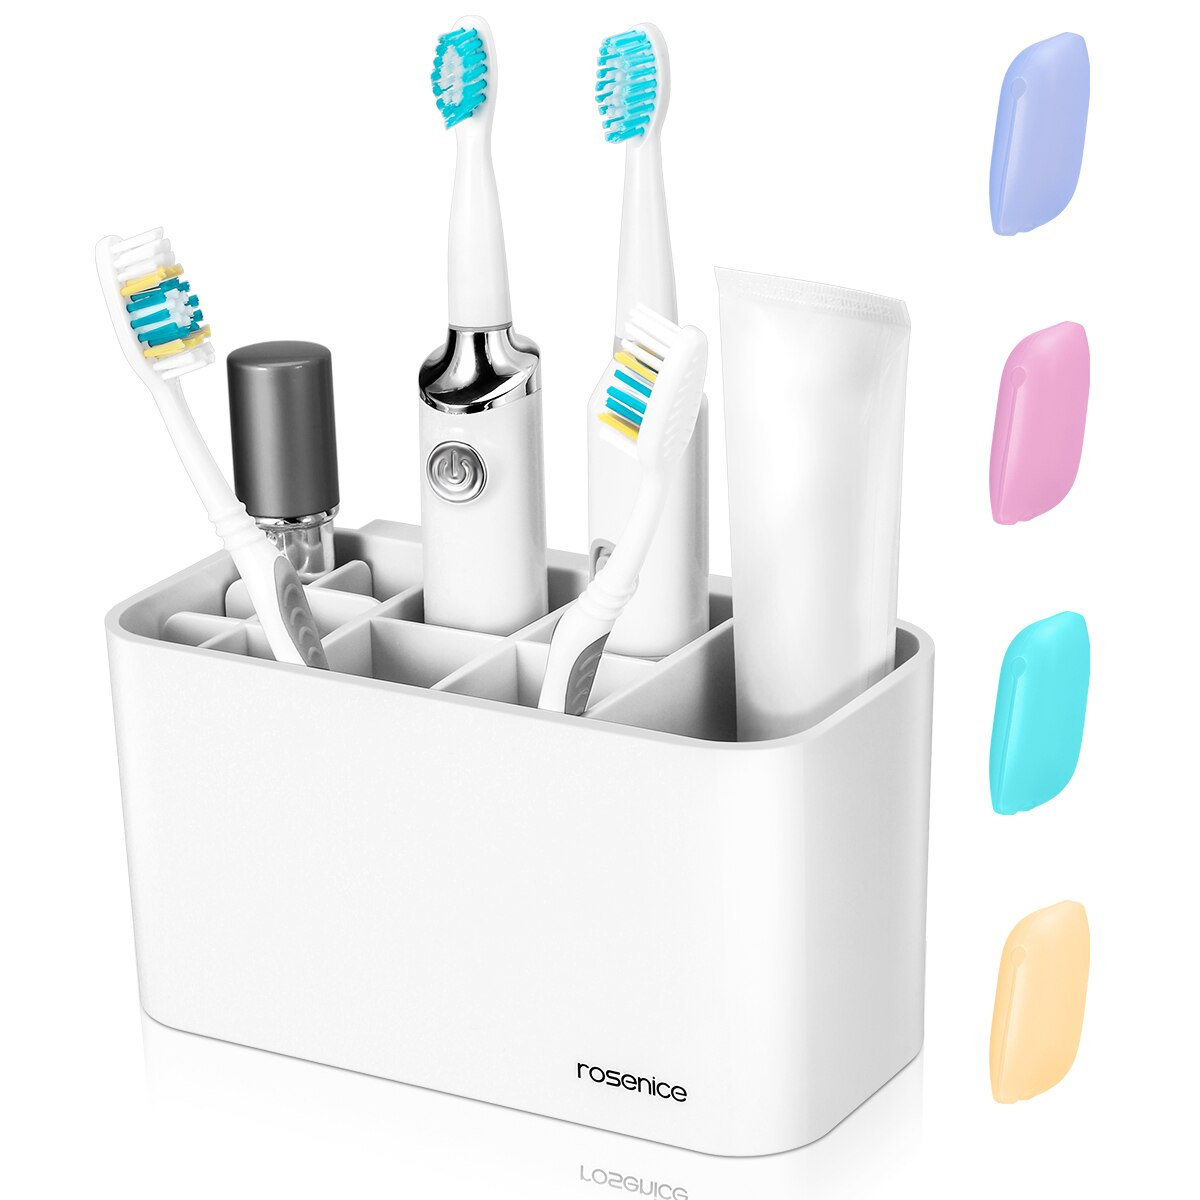 Soporte para cepillo de dientes ROSENICE, soporte multifuncional para cepillo de dientes, estante para pasta de dientes, organizador para inodoro para baño A30